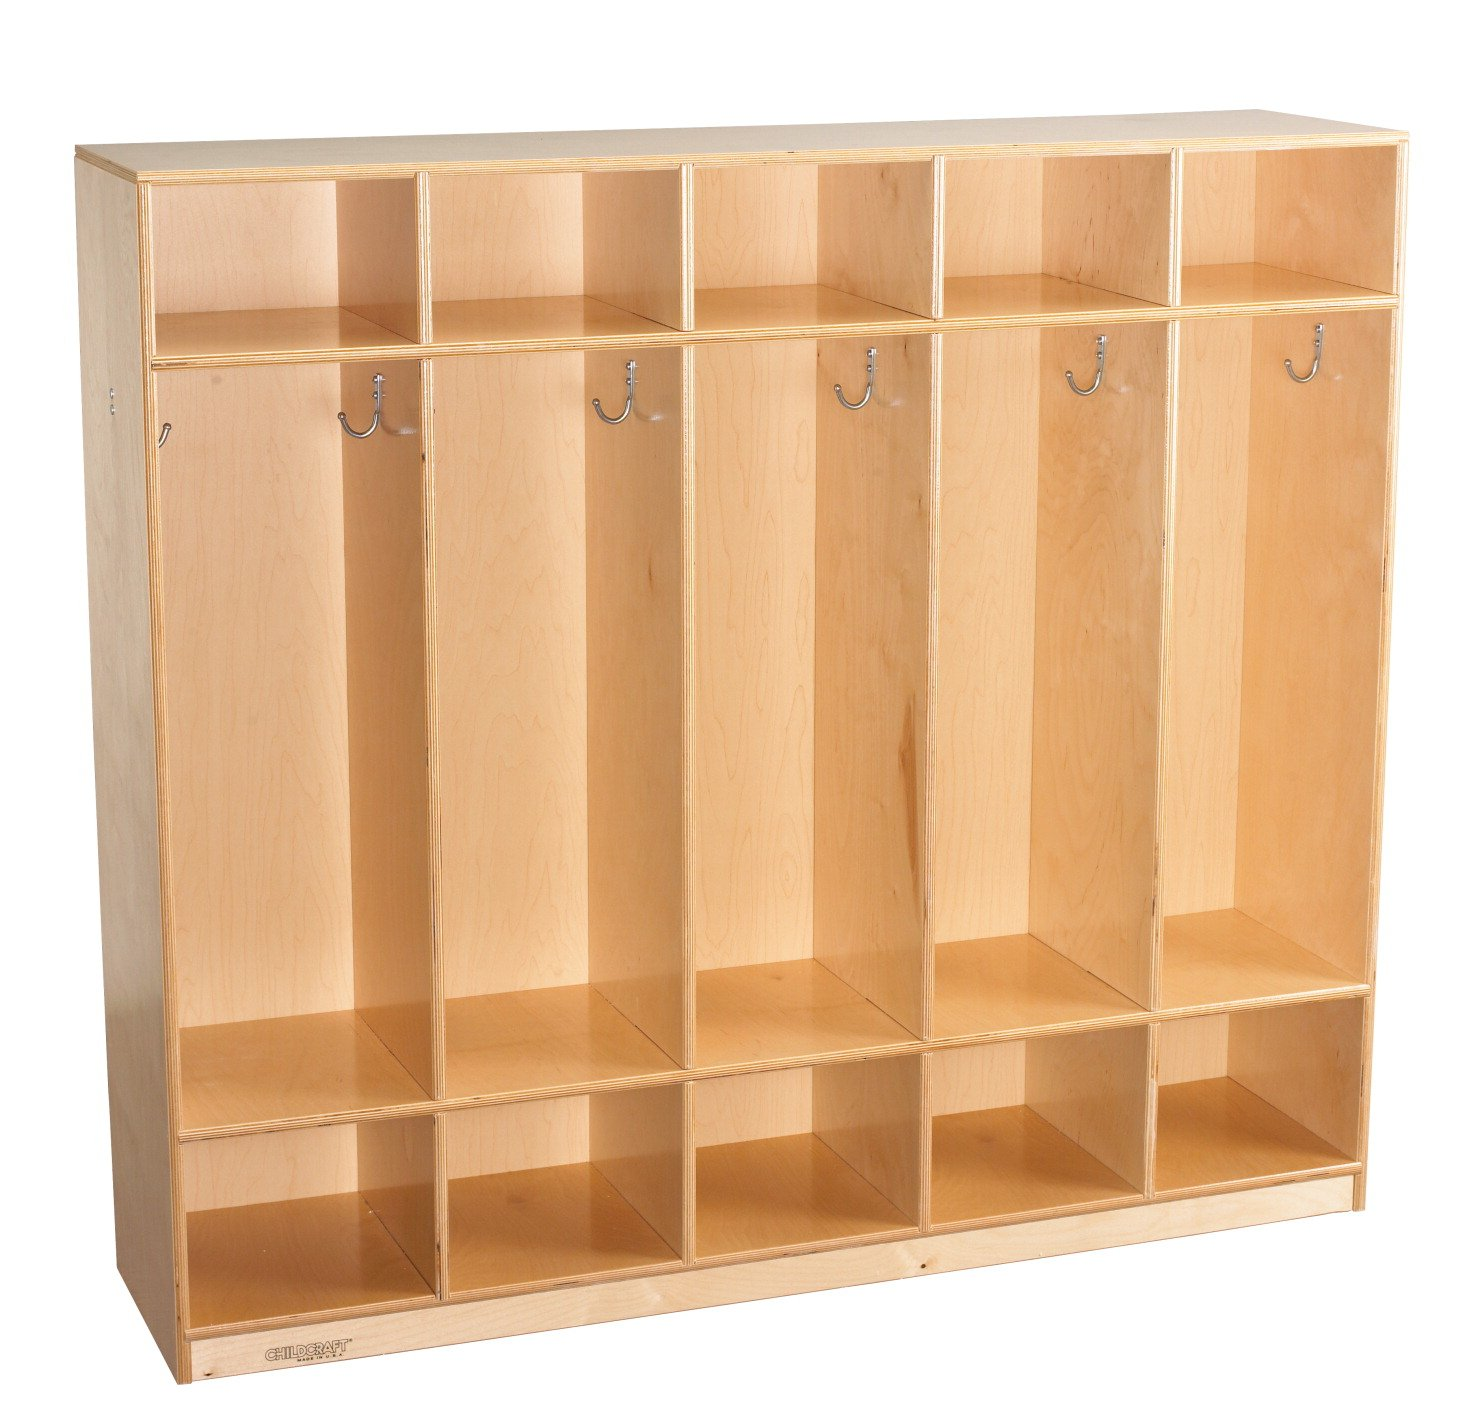 Childcraft 272044 Straight Sided Coat Locker, Wood, 53-3/4'' x 13'' x 48'', Natural Wood Tone